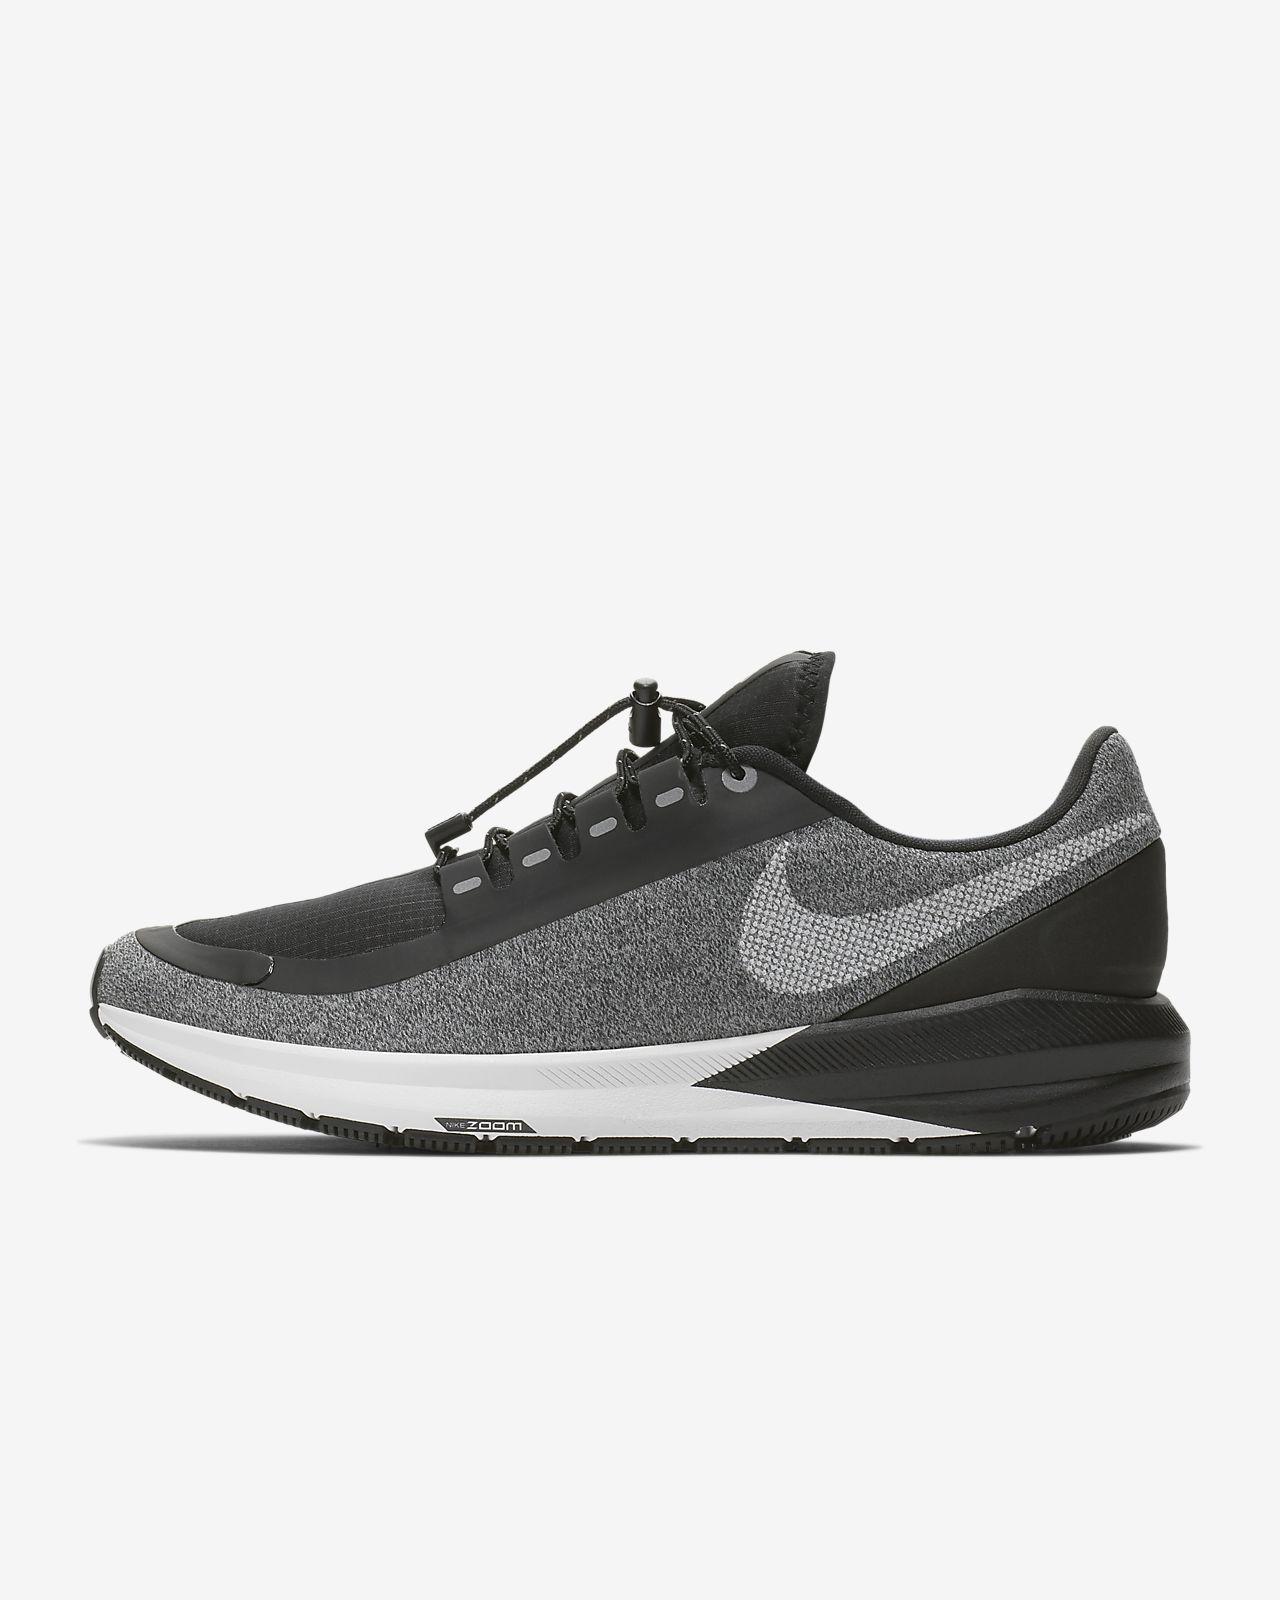 Women s Running Shoe. Nike Air Zoom Structure 22 Shield Water-Repellent 71bffaebead